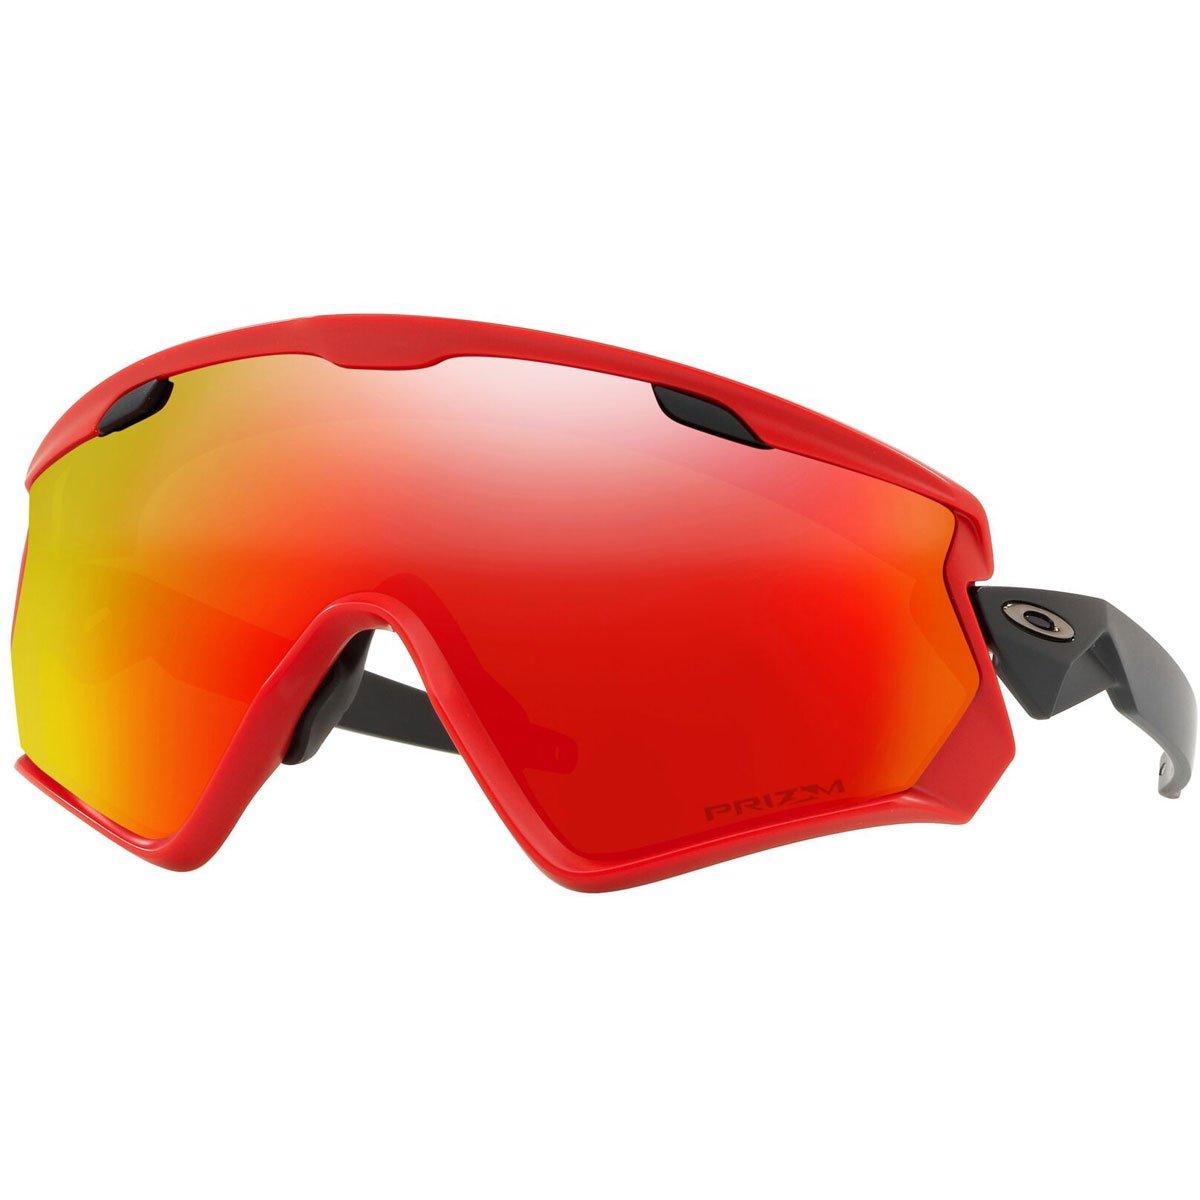 Oakley Men's Wind Jacket 2.0 Non-Polarized Iridium Rectangular Sunglasses, Viper Red, 0 mm by Oakley